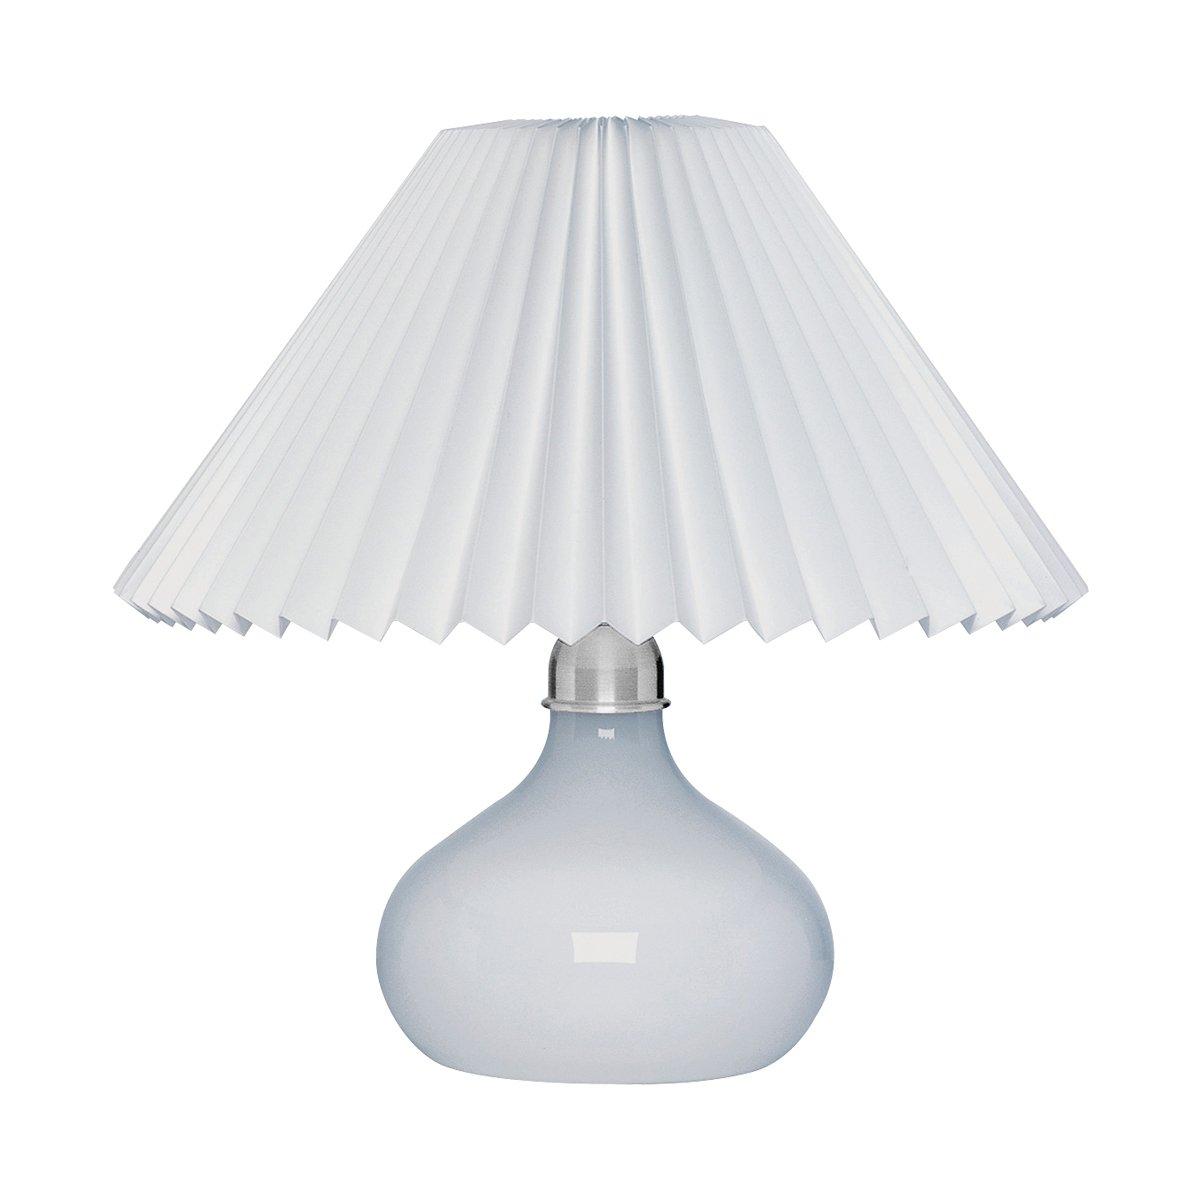 LE KLINT Classic Model 314 Tafellamp - Chroom